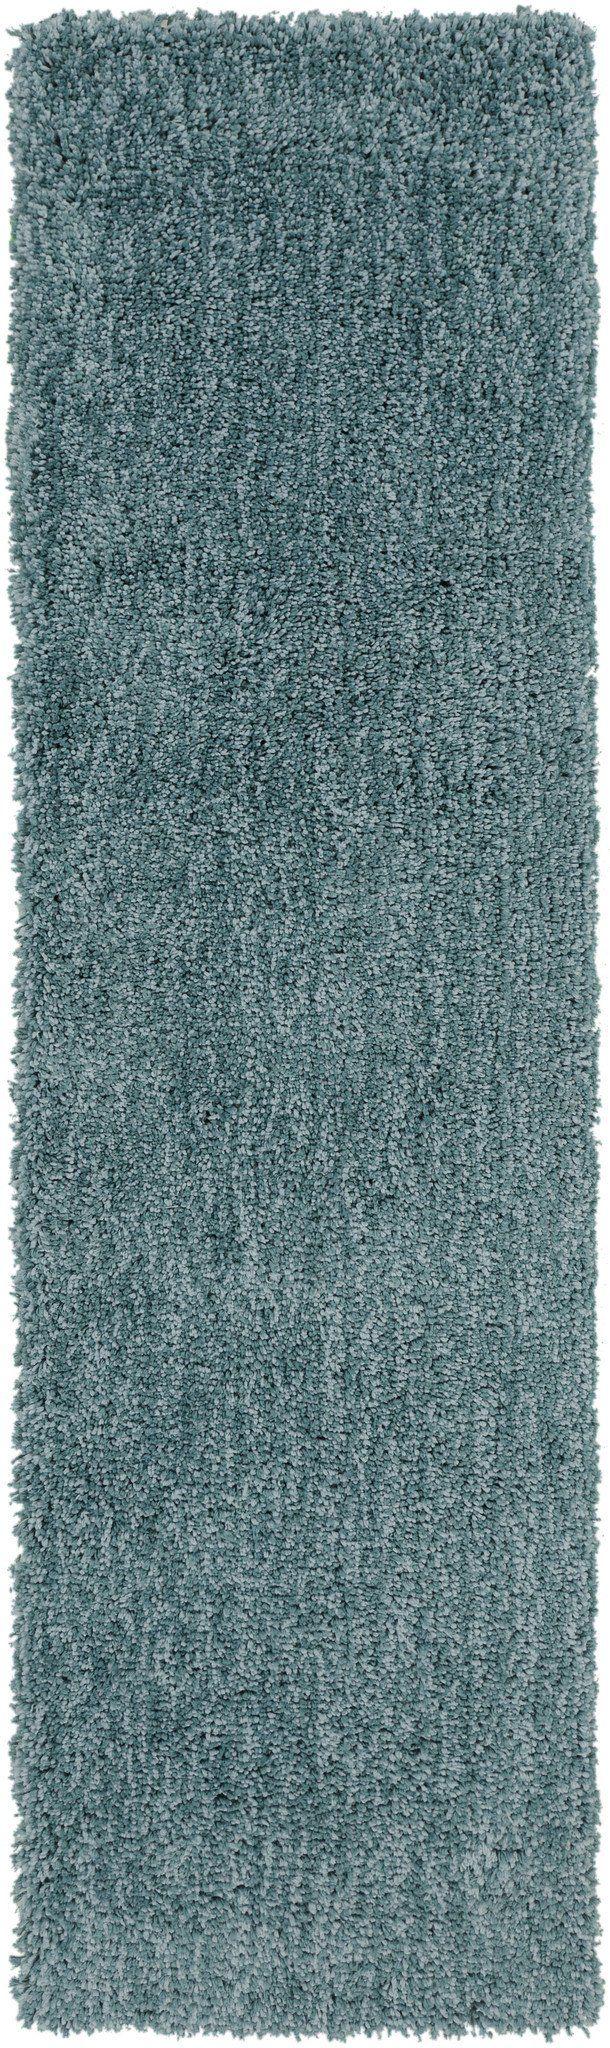 Surya Mellow MLW9014 Blue Plush Area Rug